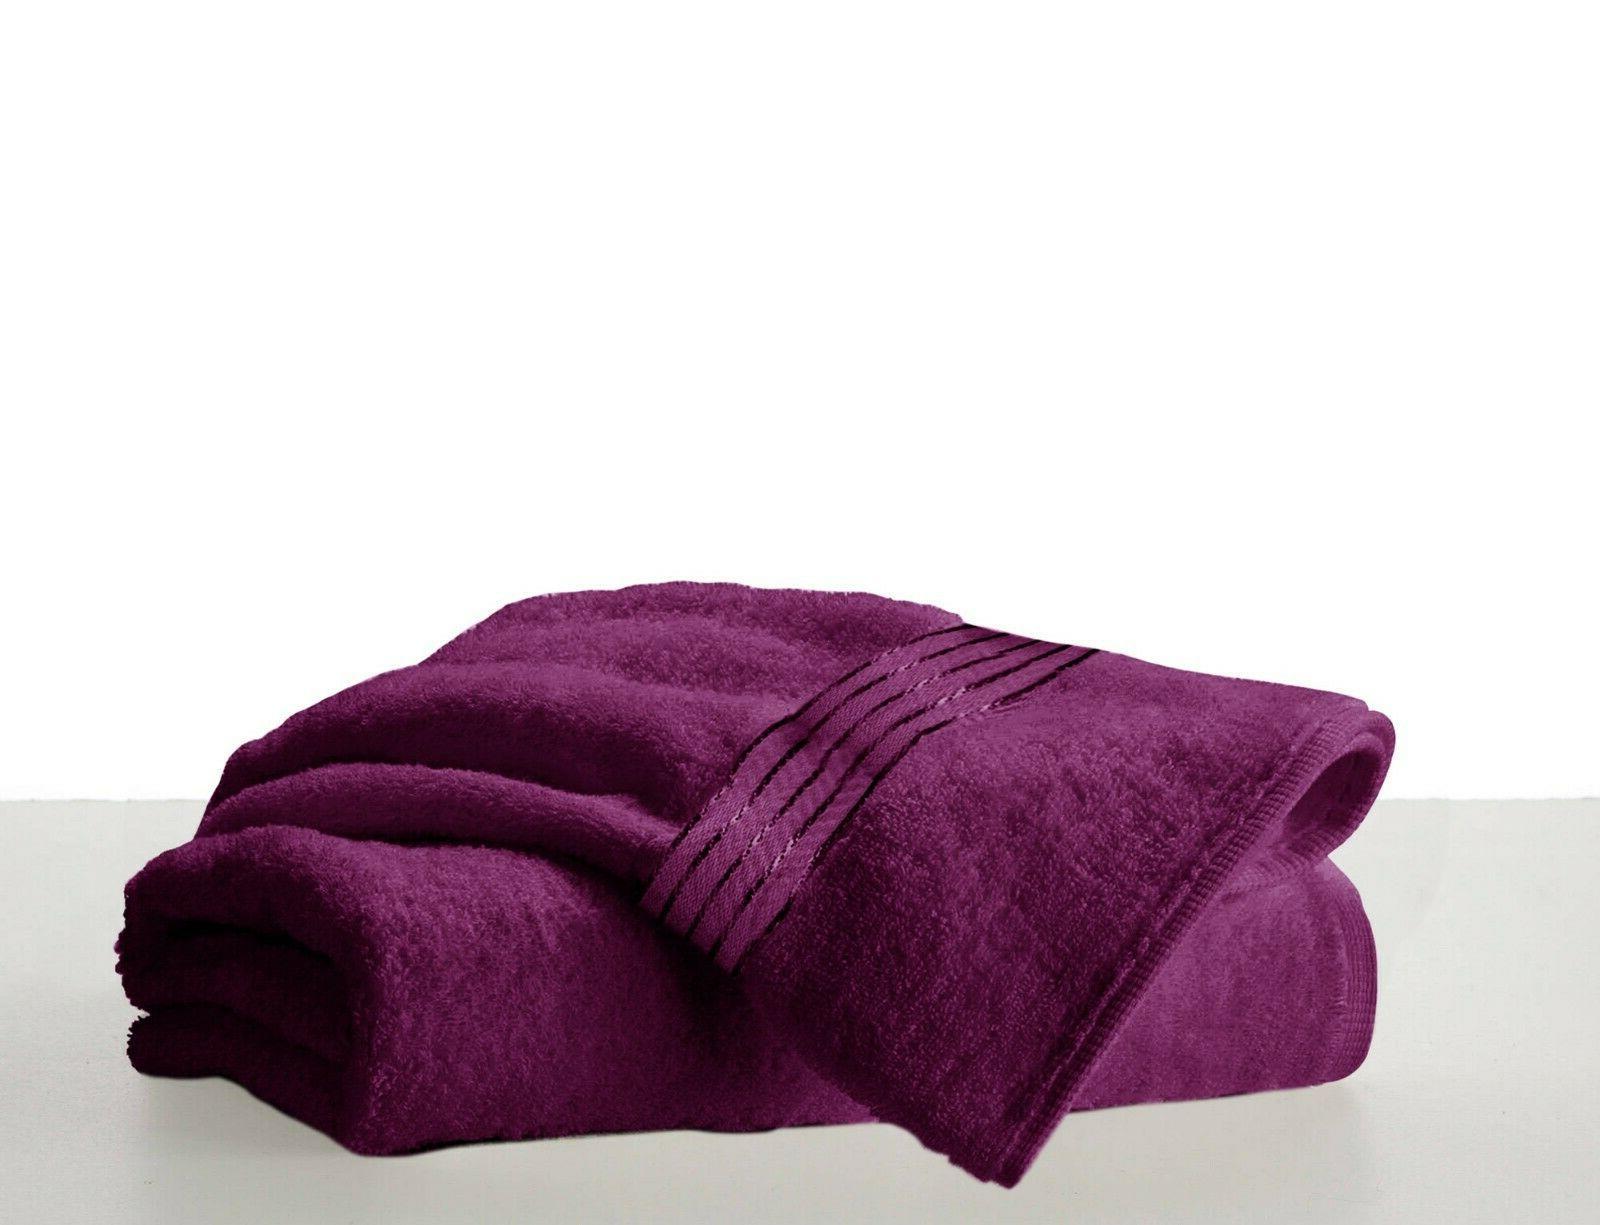 Luxury Towels Packs Sets Cotton Soft Grey